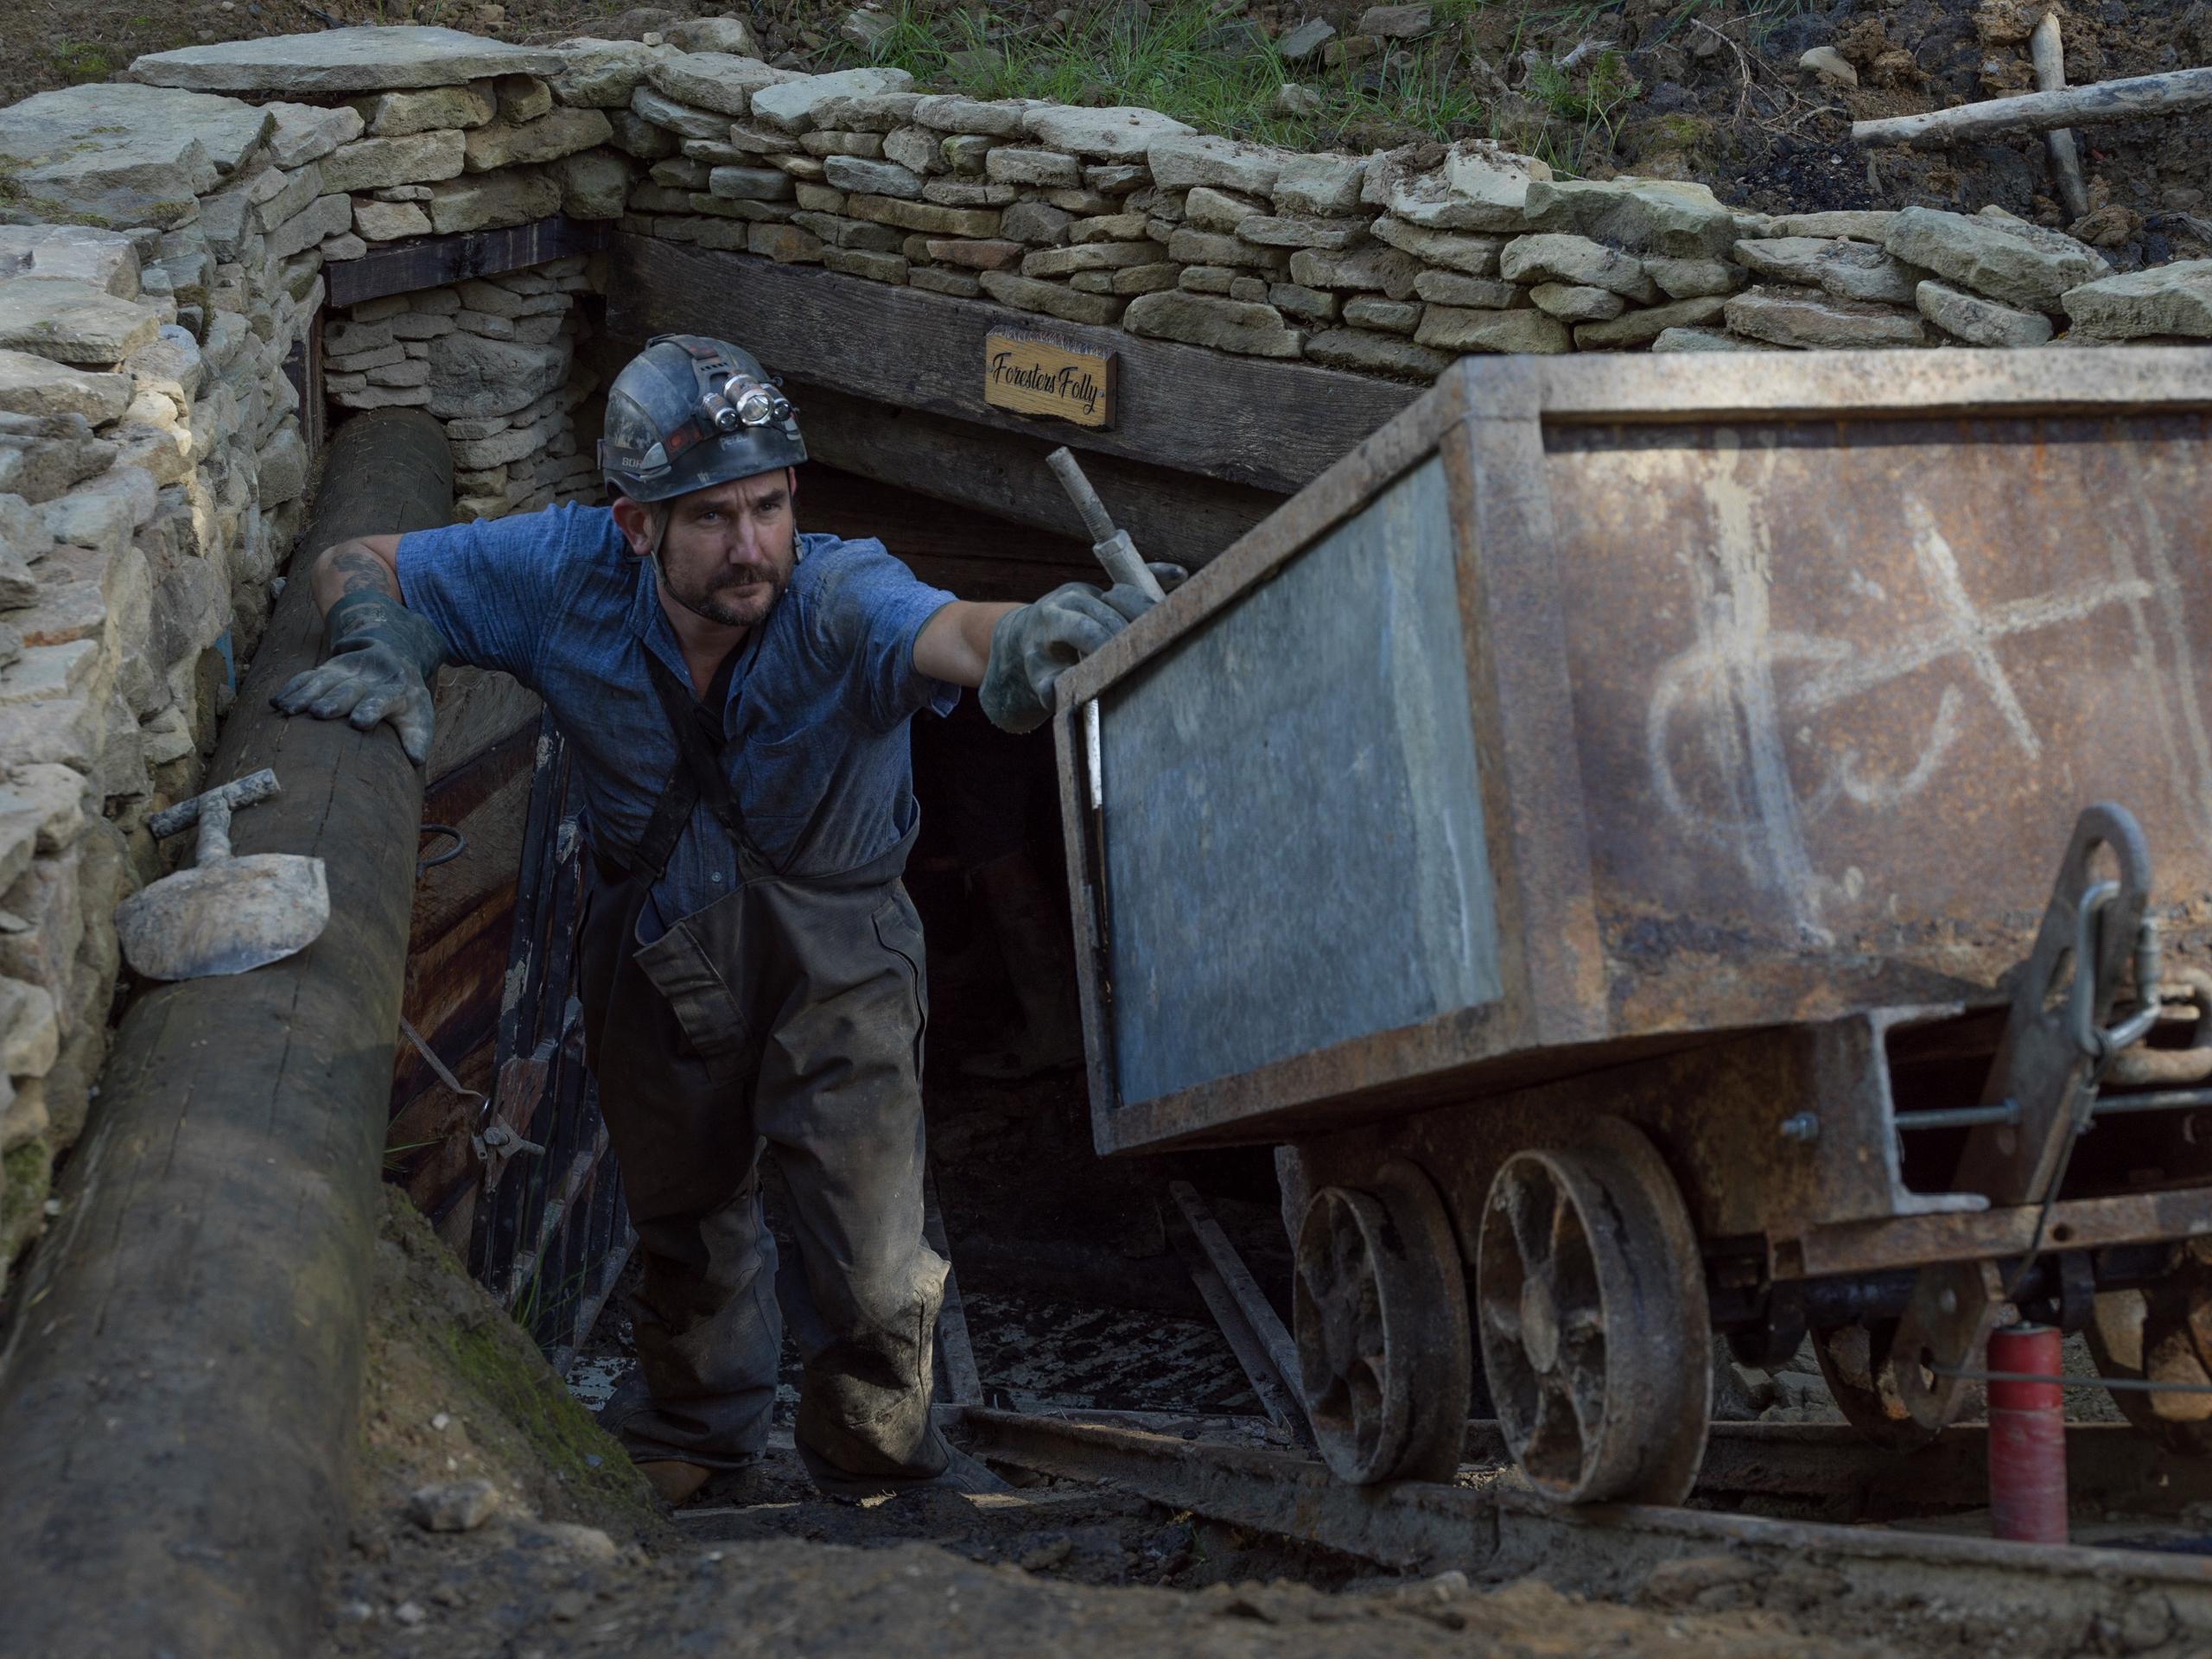 Miner exiting mine entrance